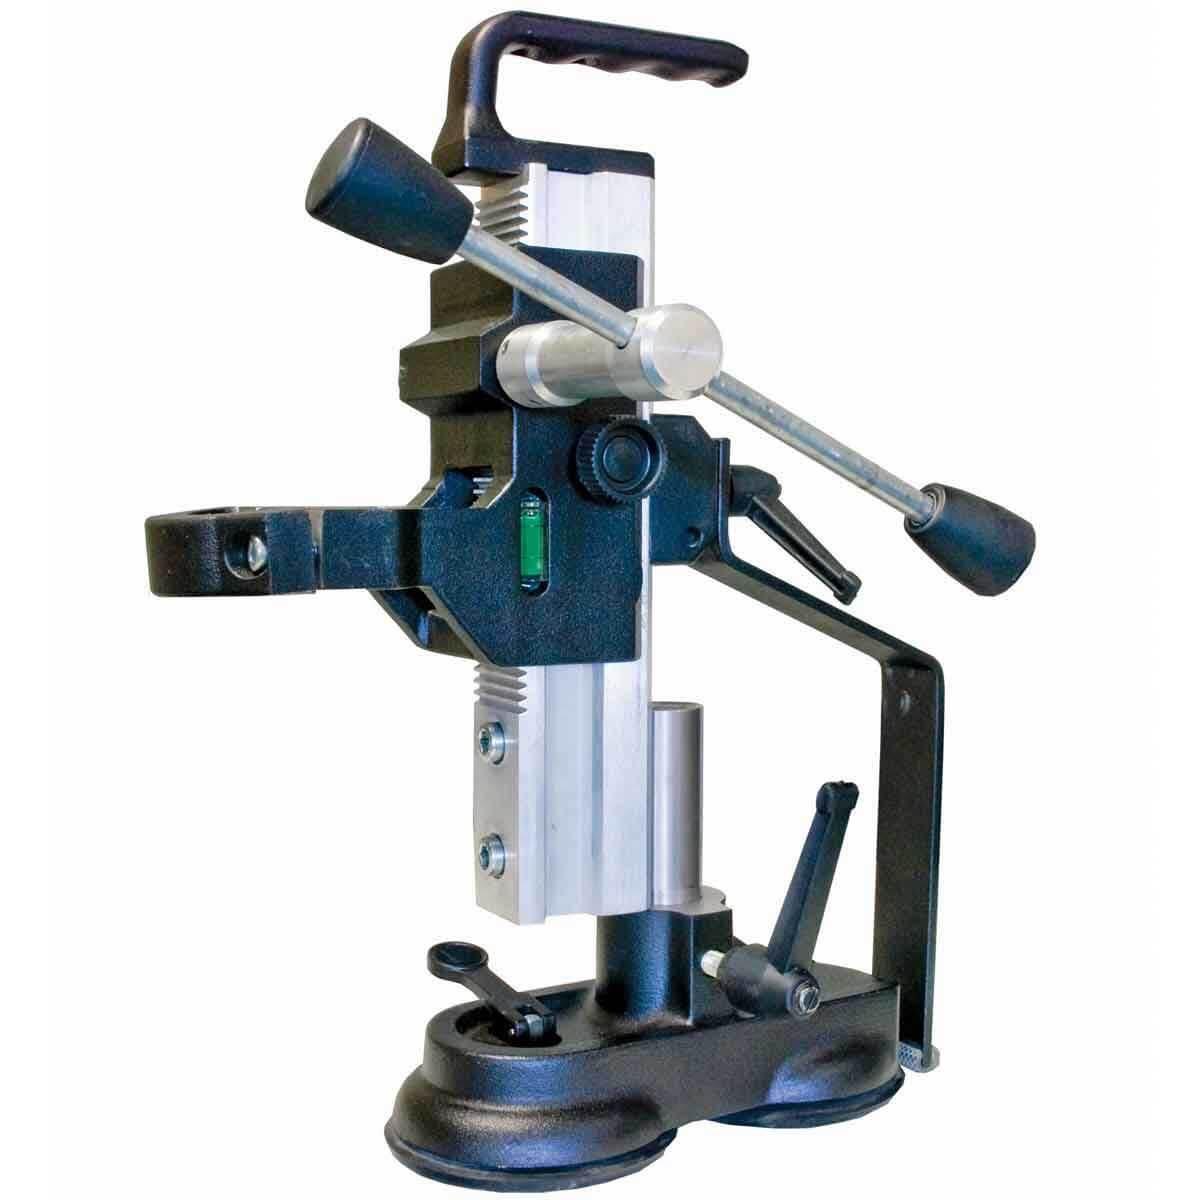 Eibenstock drill stand handle